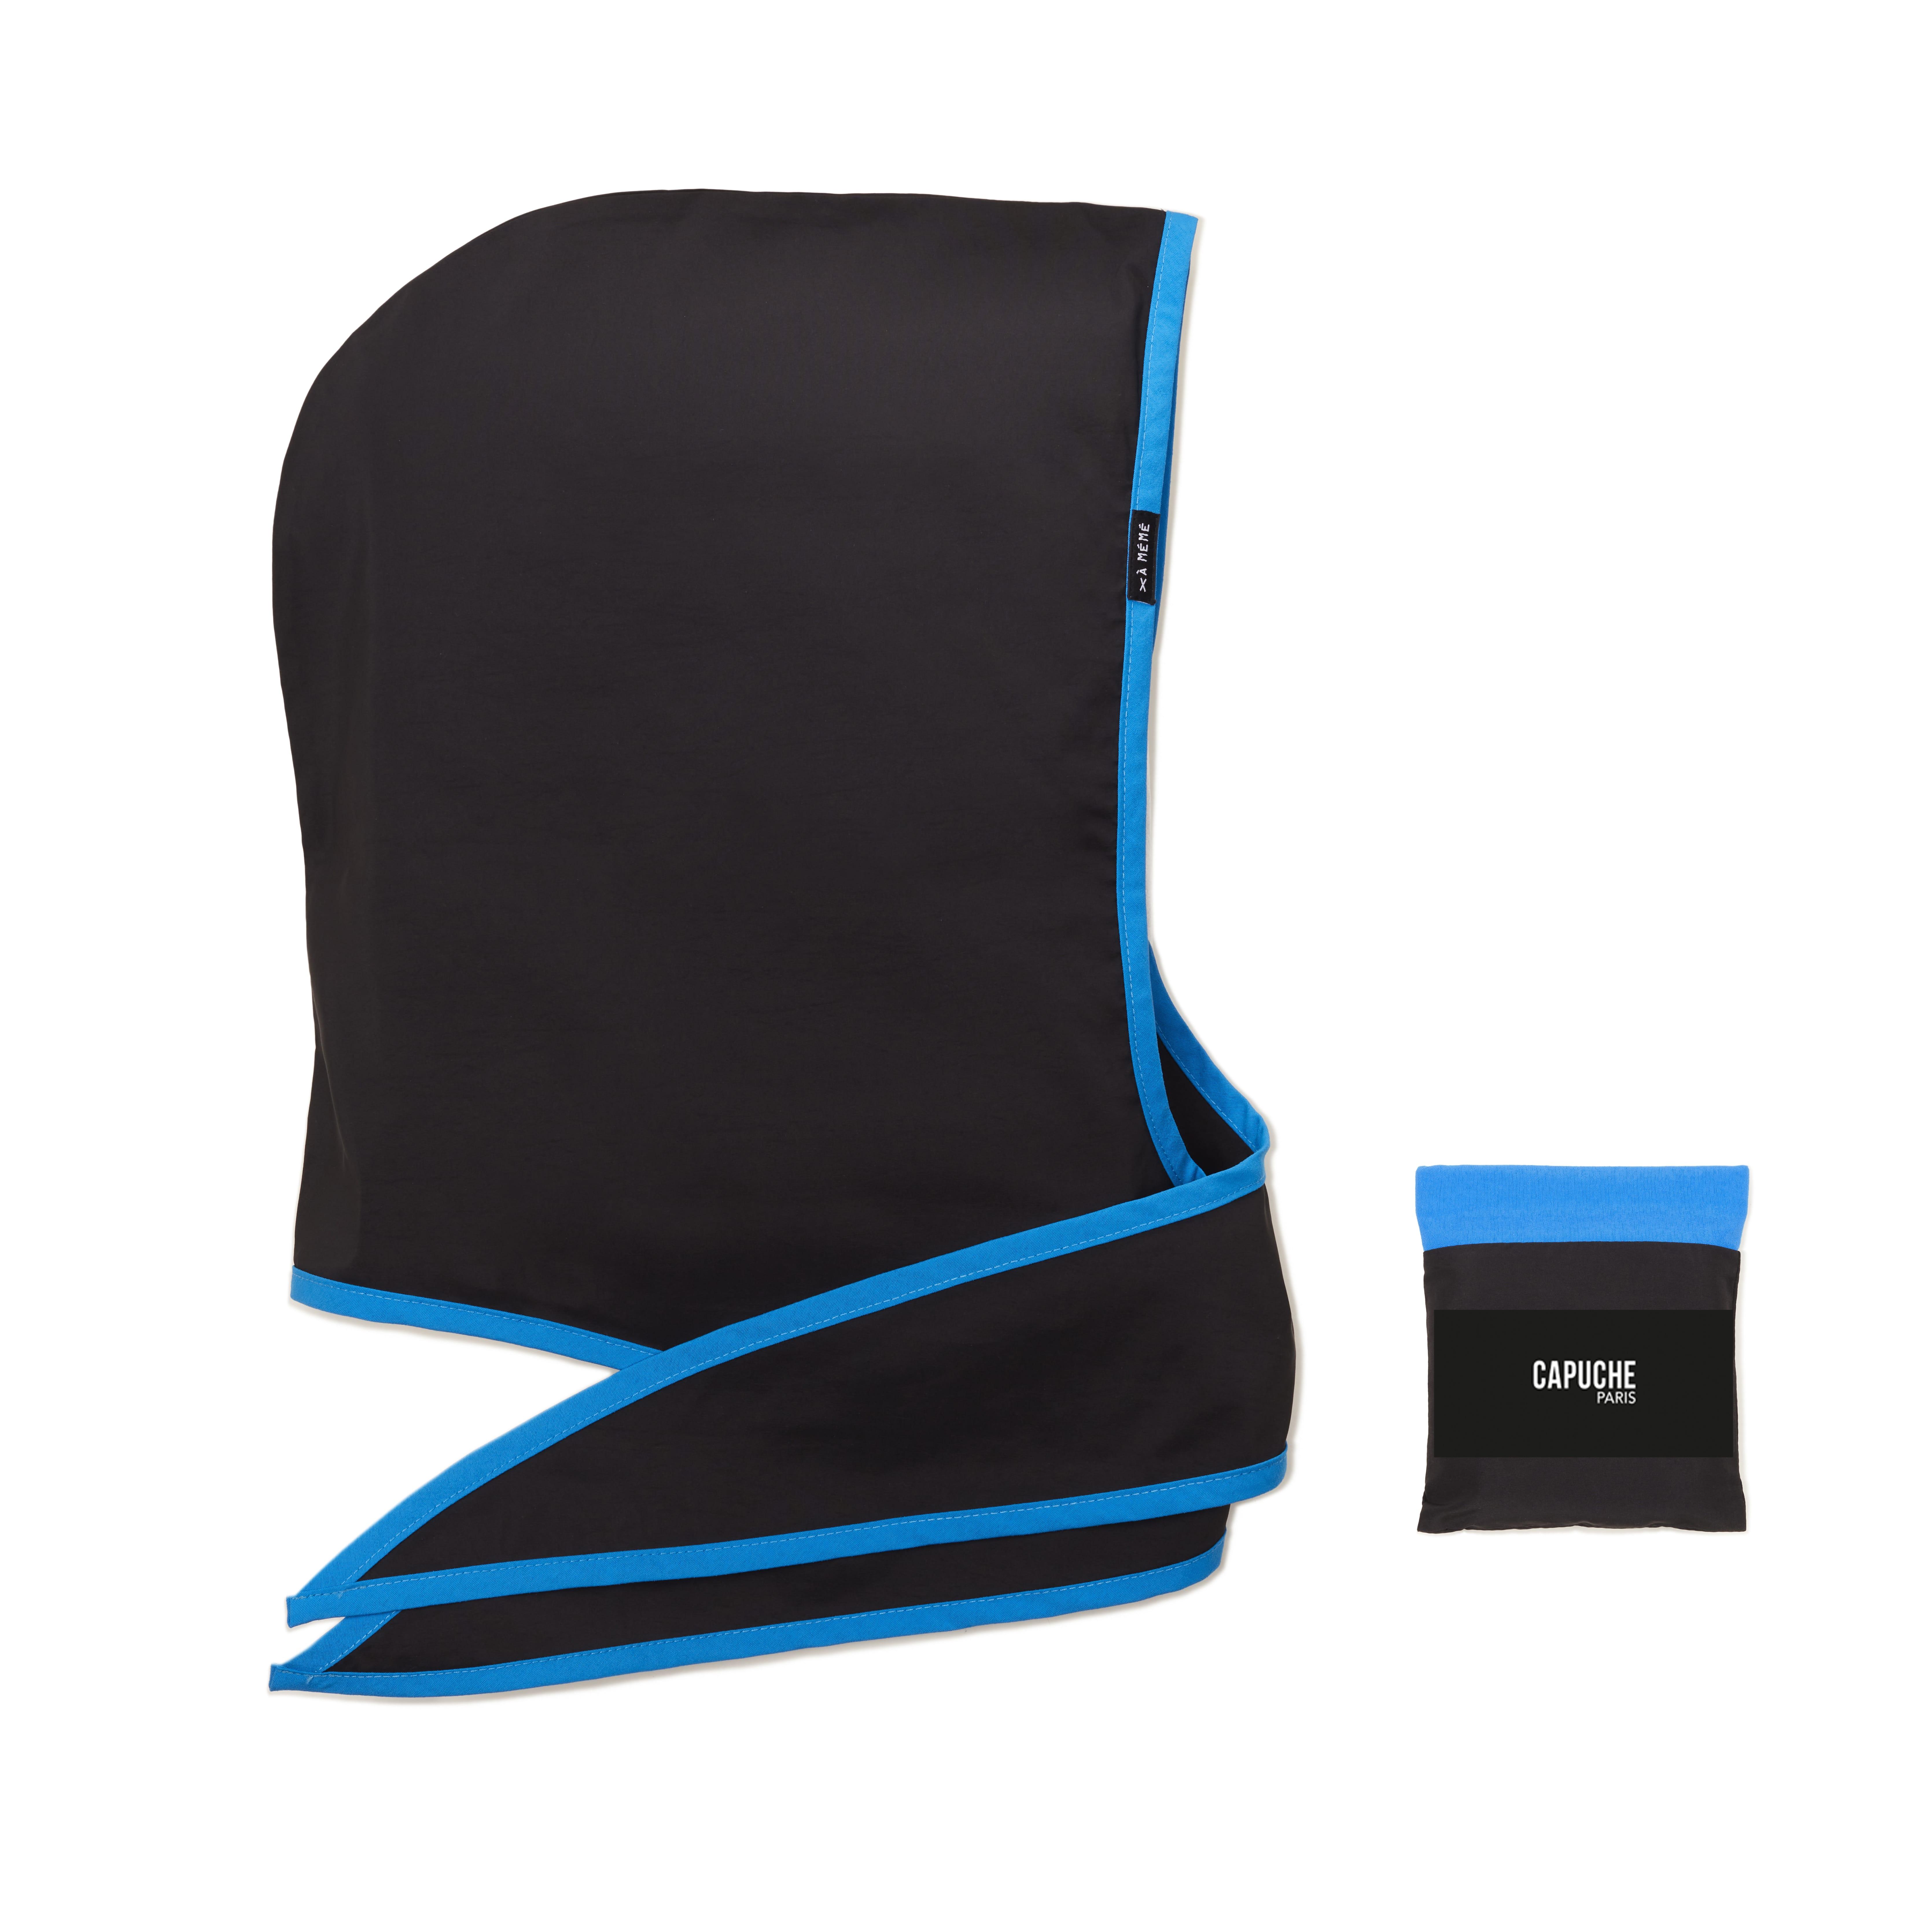 Capuche Paris - Black Blue Rain Hood